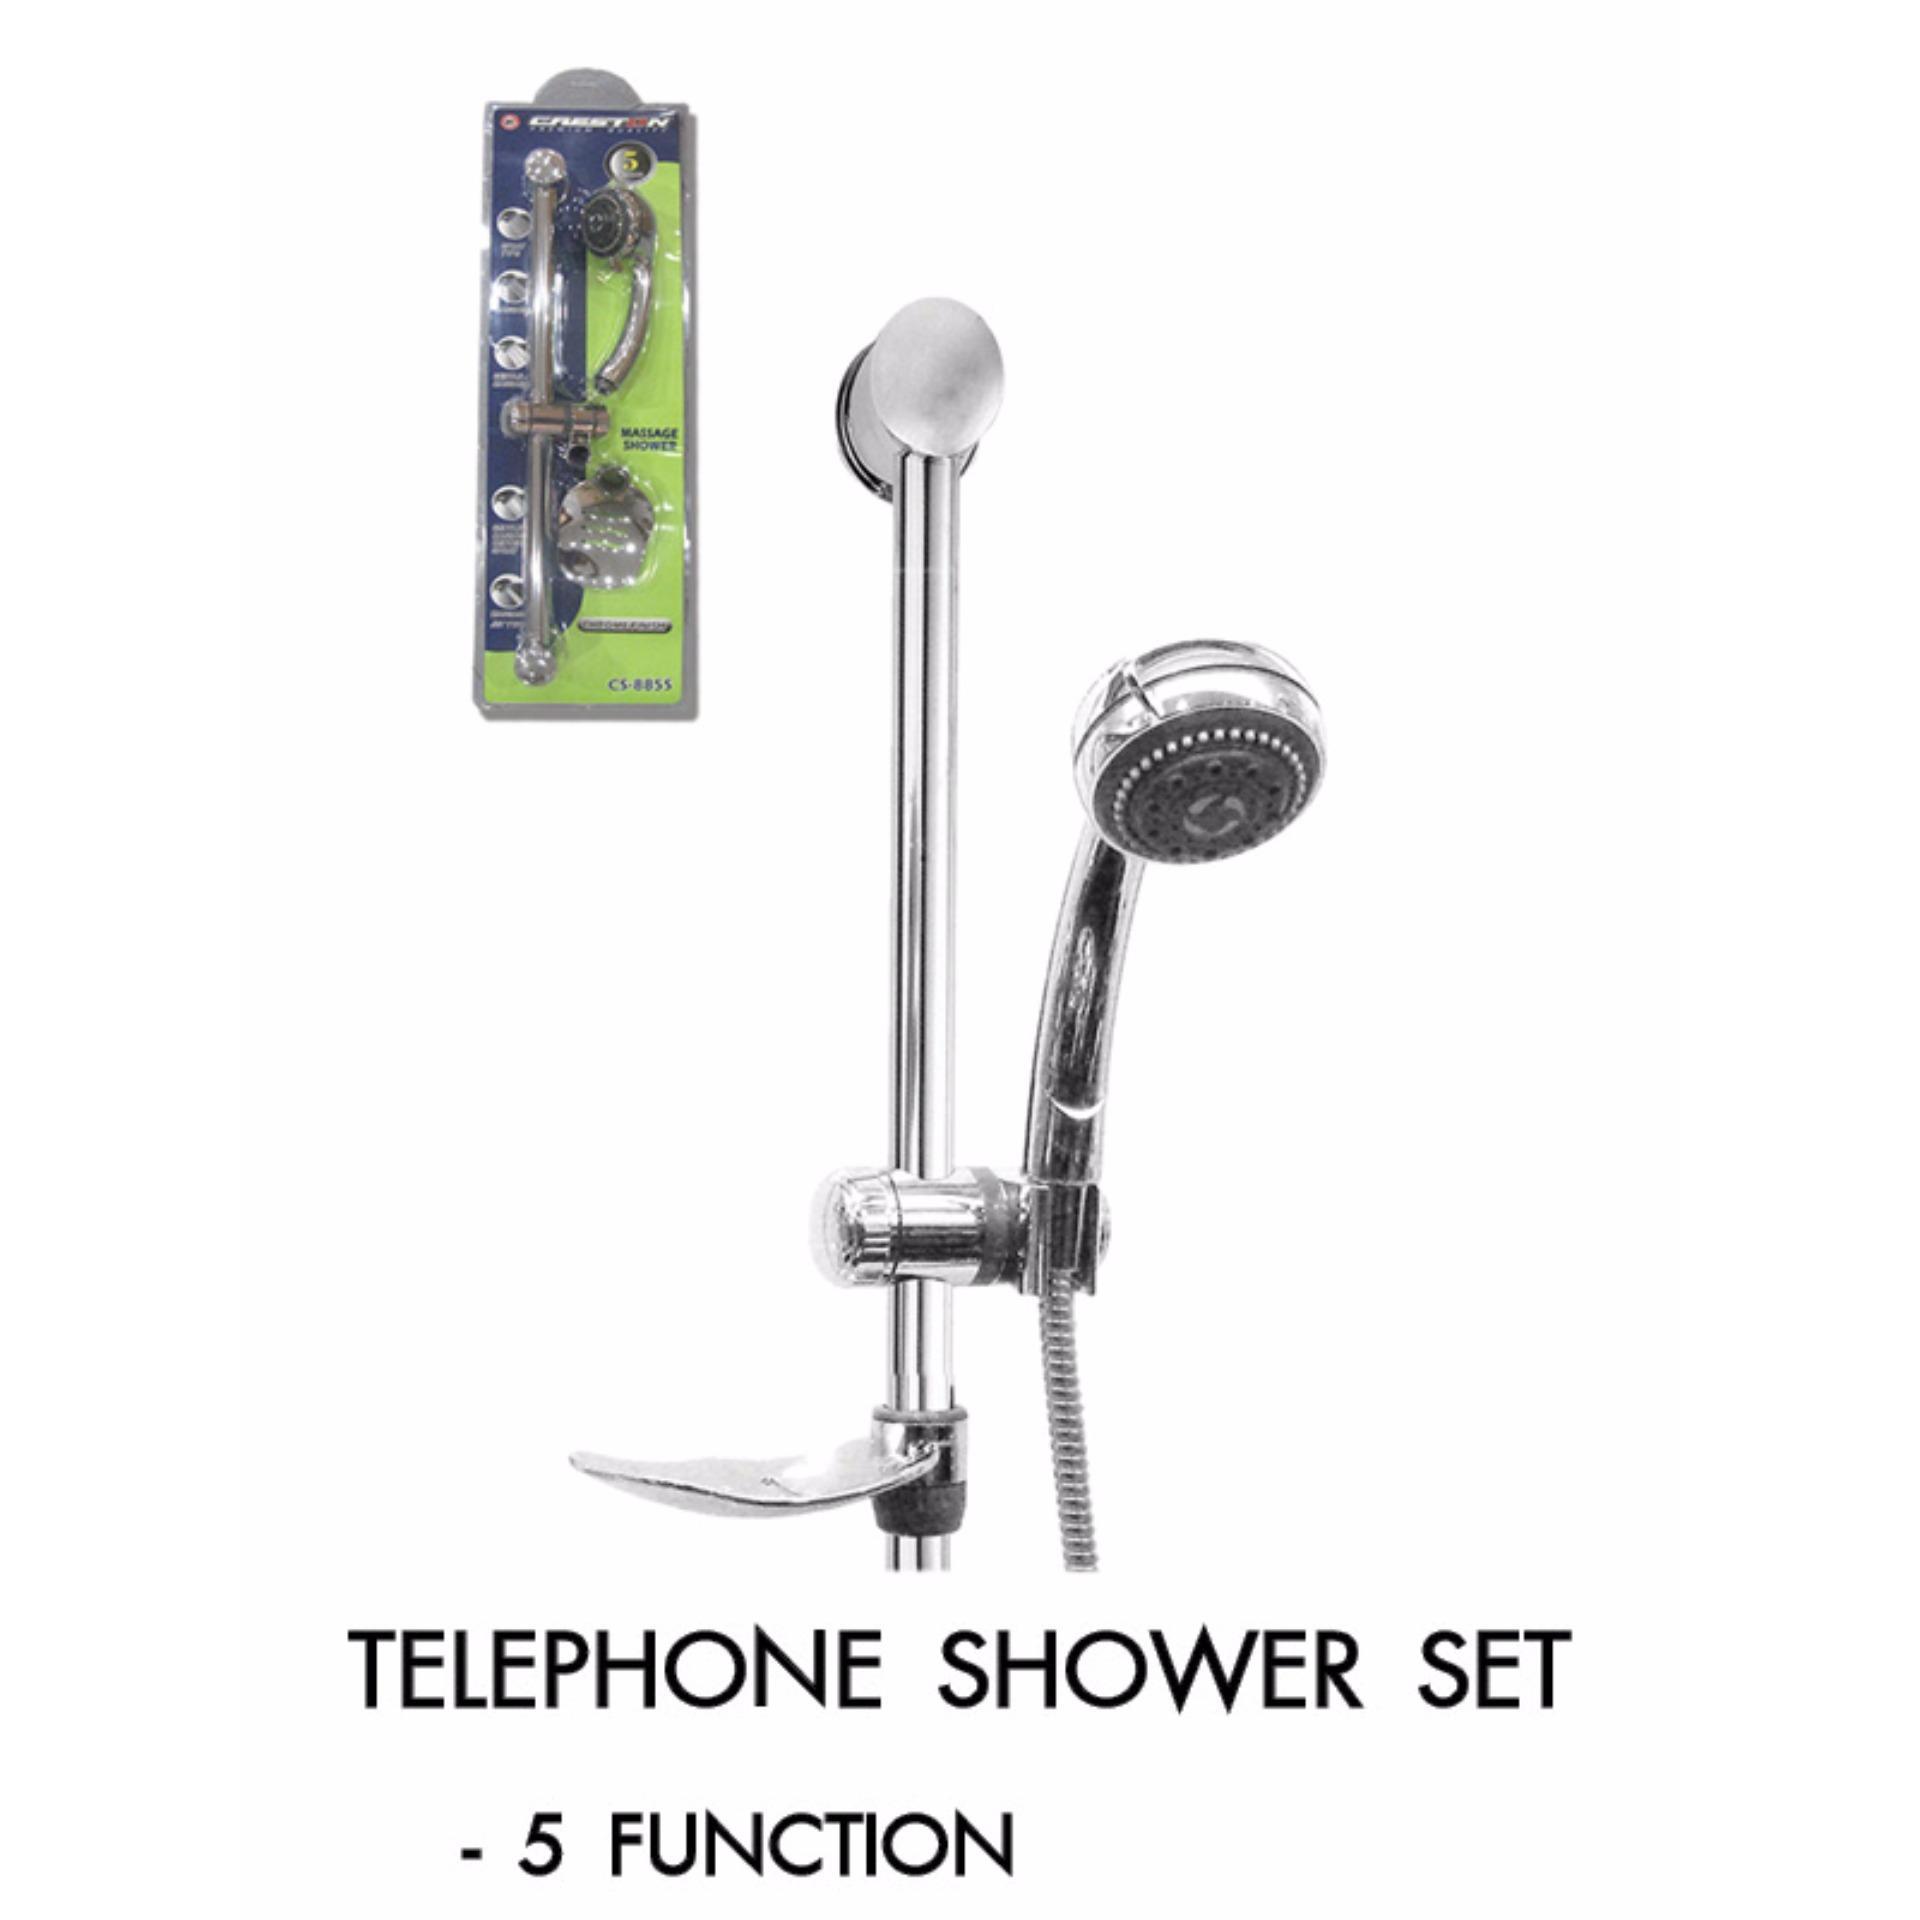 Creston Telephone Shower Set (5 Function) Philippines